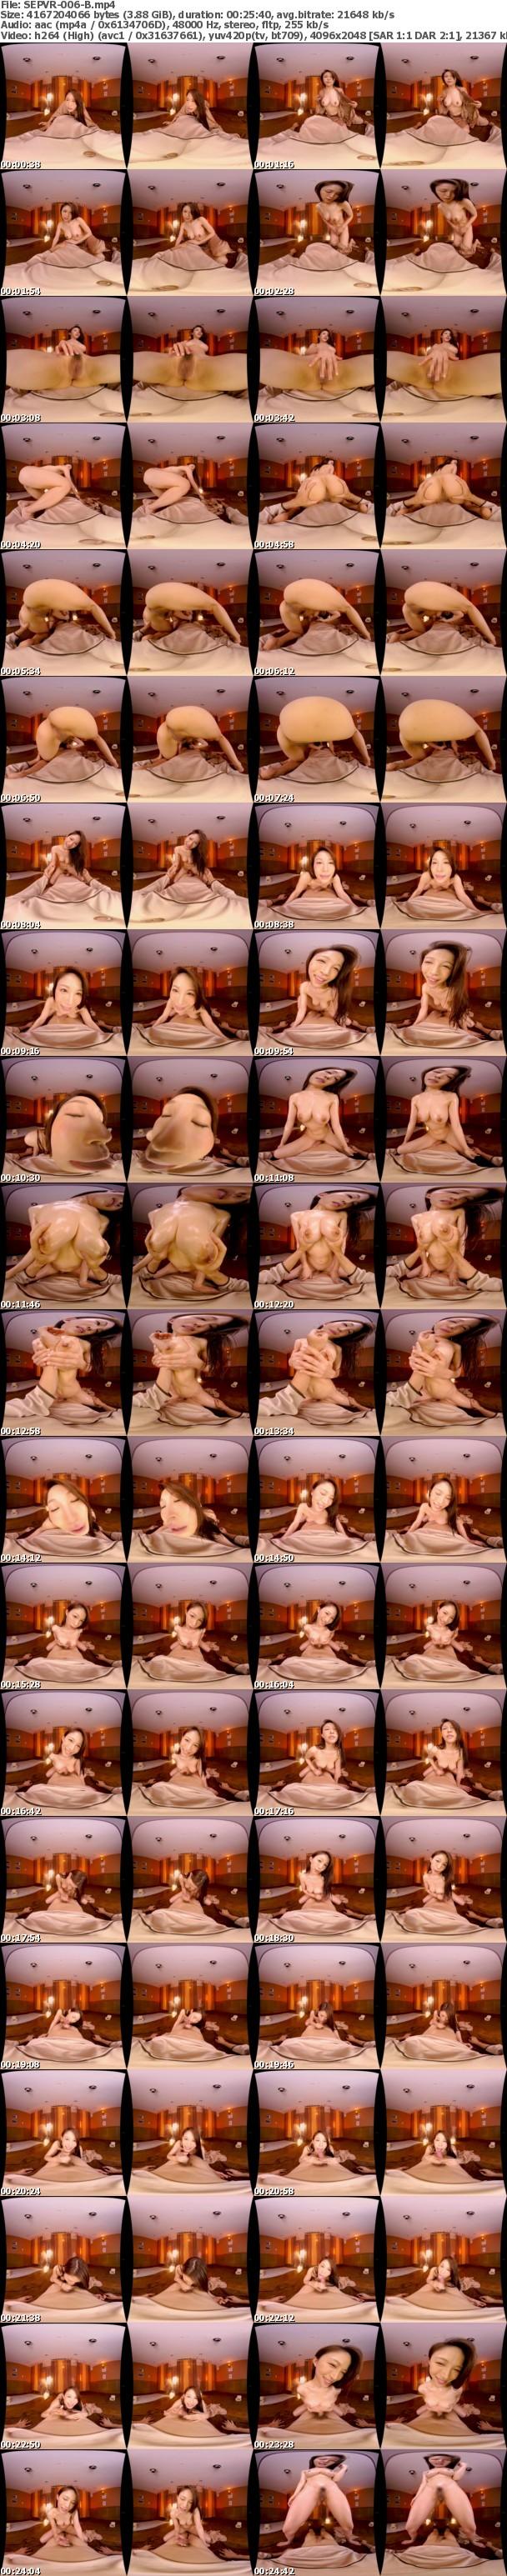 (VR) SEPVR-006 「神展開!混浴OK岩盤浴体験3DVR!カップルが僕を挟んで岩盤浴デート!汗だくの密着浴衣は乳首ビンビン!チラチラ見てると巨乳を見せつけ誘惑してきたので彼氏の横でNTR中出しセックス!身も心もデトックス出来ました。」 凛音とうか